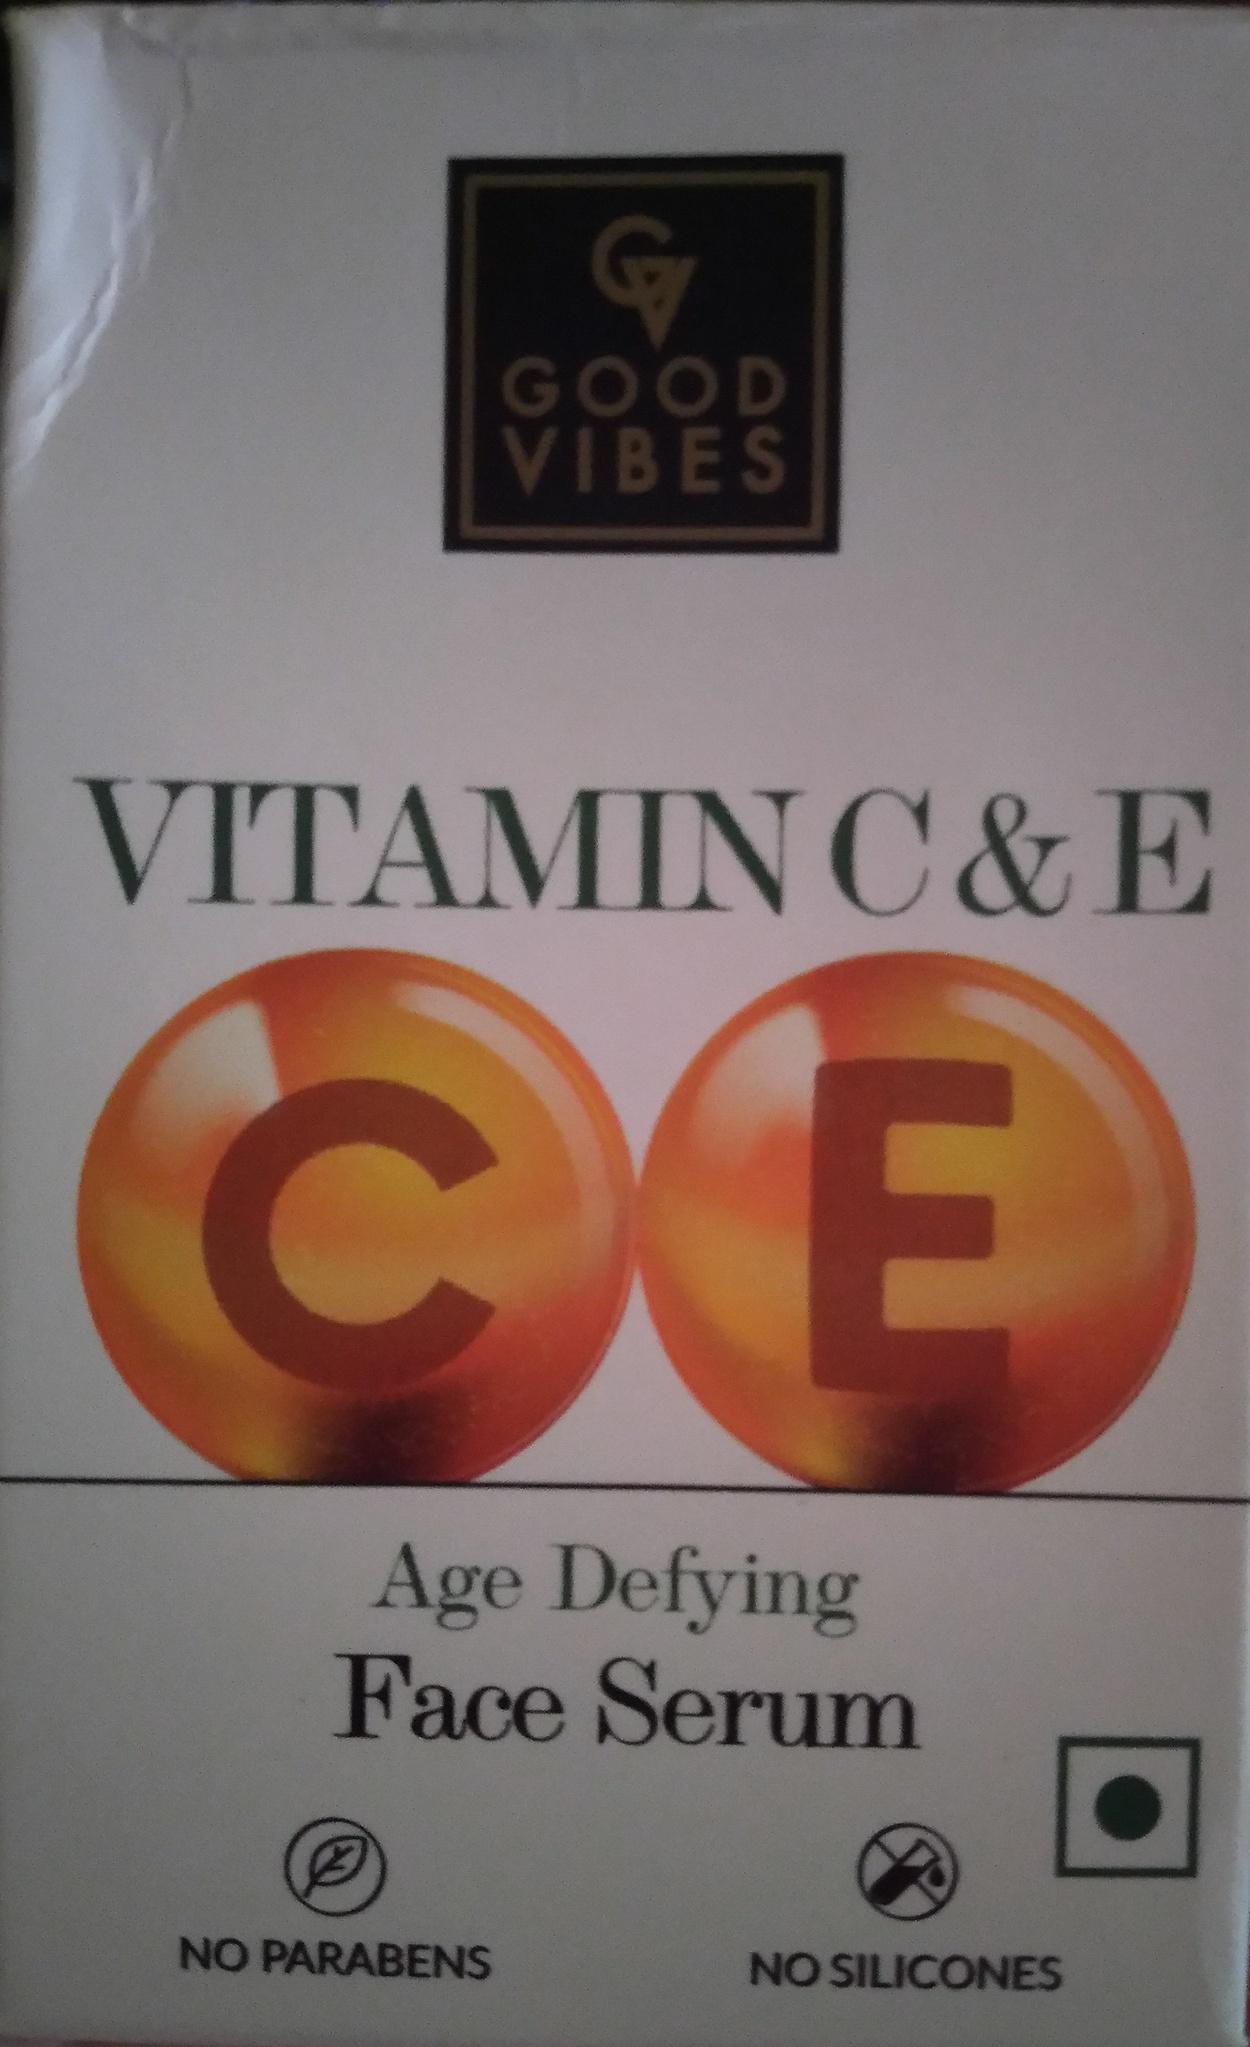 Good Vibes New Vitamin C And E Face Serum (White Box)